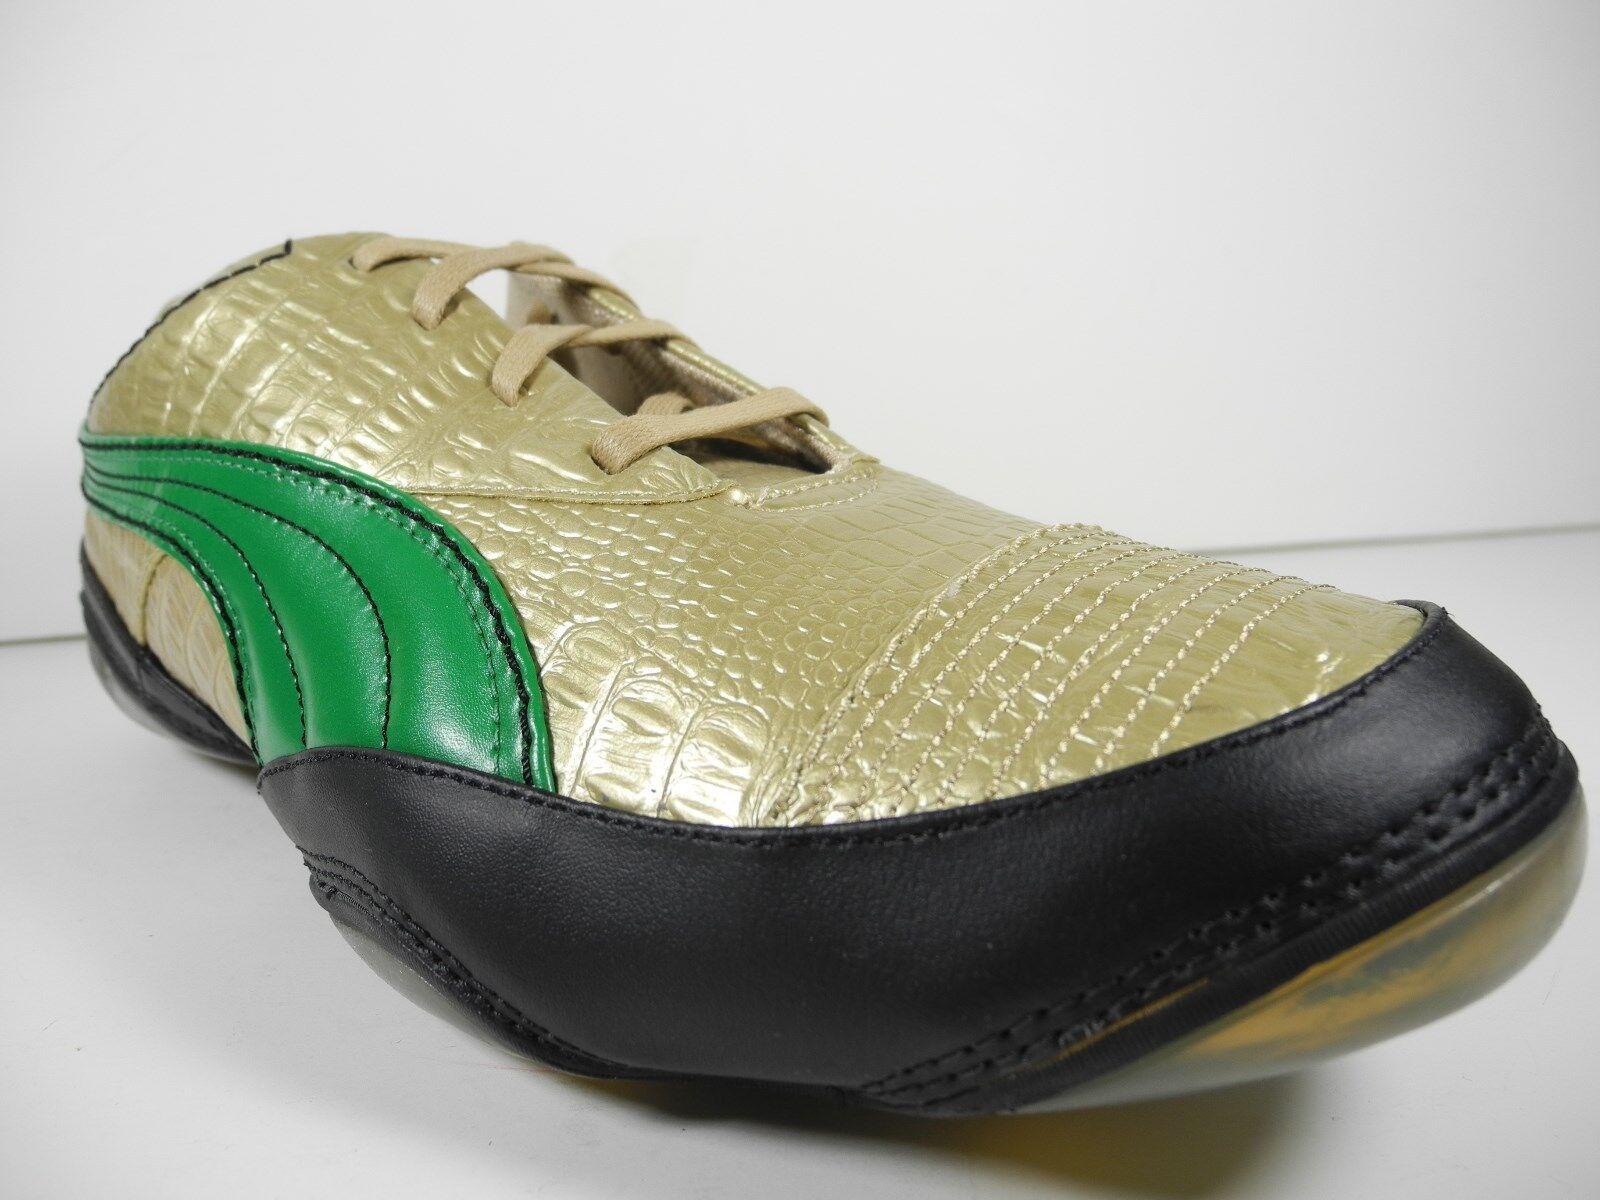 NEW Puma USAN METALLIC CROC Men's Shoes Size US 7.5 1